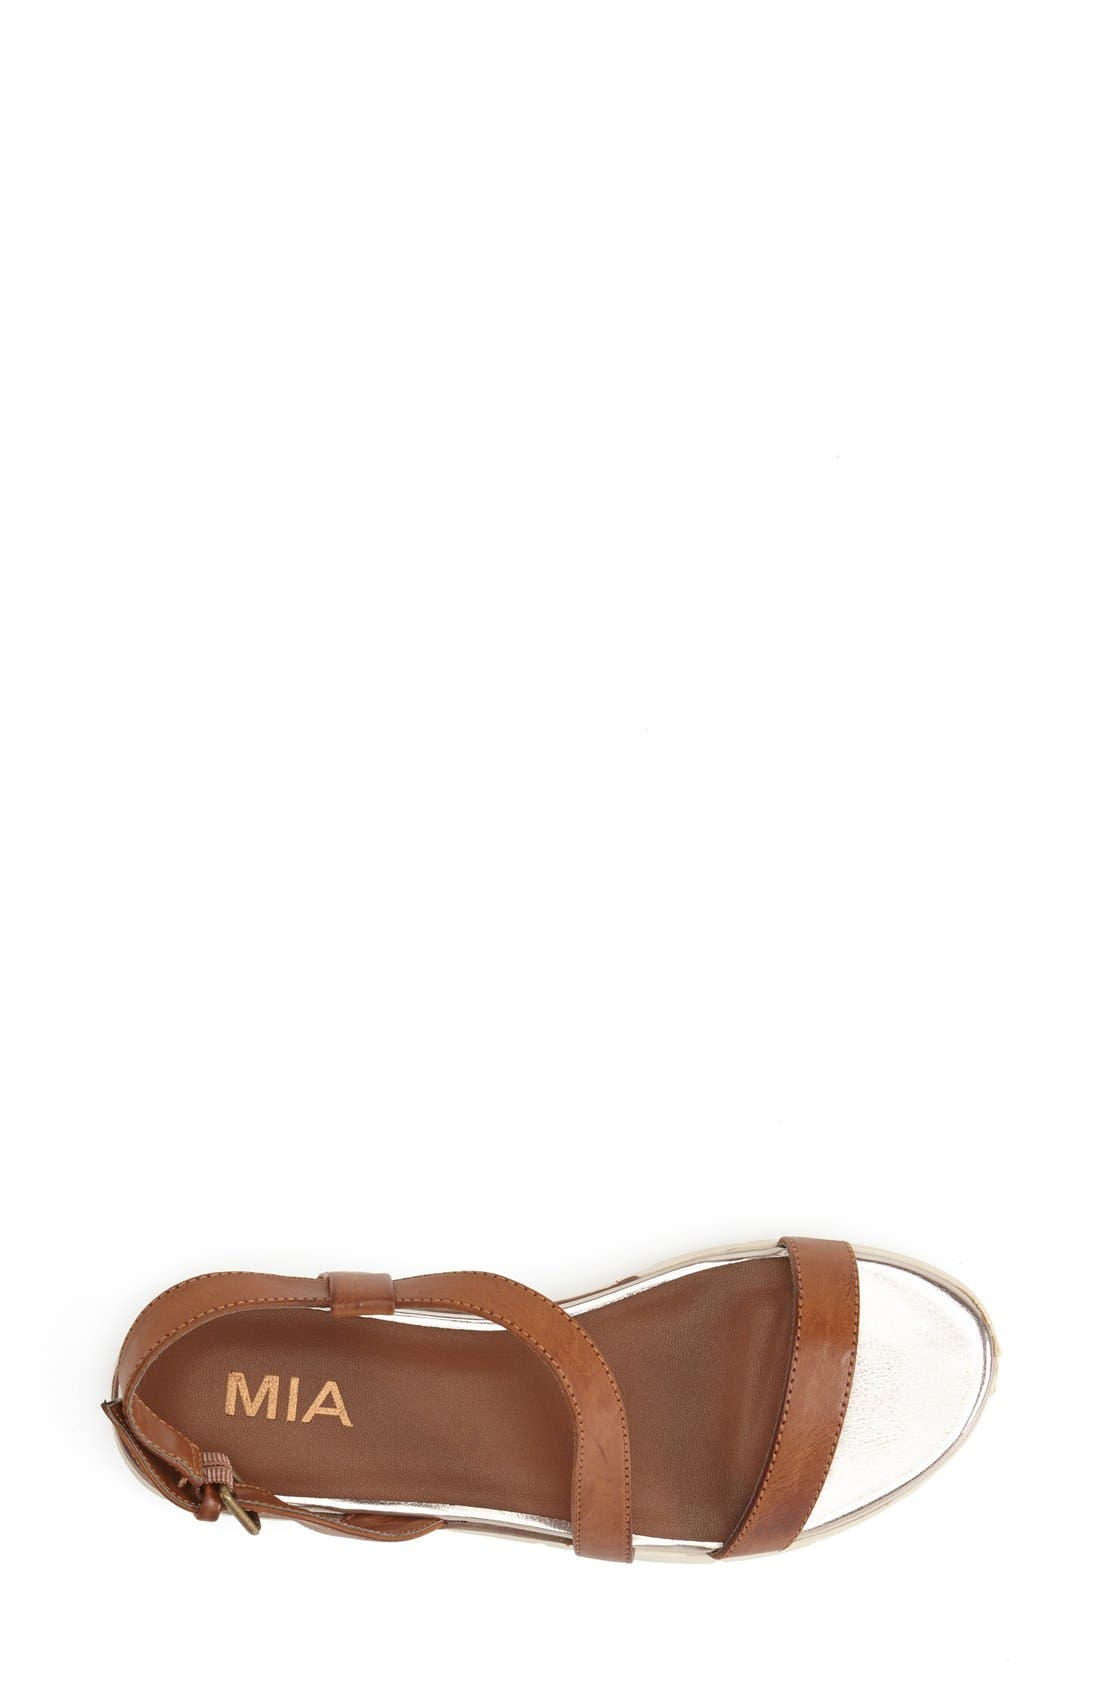 Alternate Image 3  - MIA 'Baseline' Slingback Flat Sandal (Women)